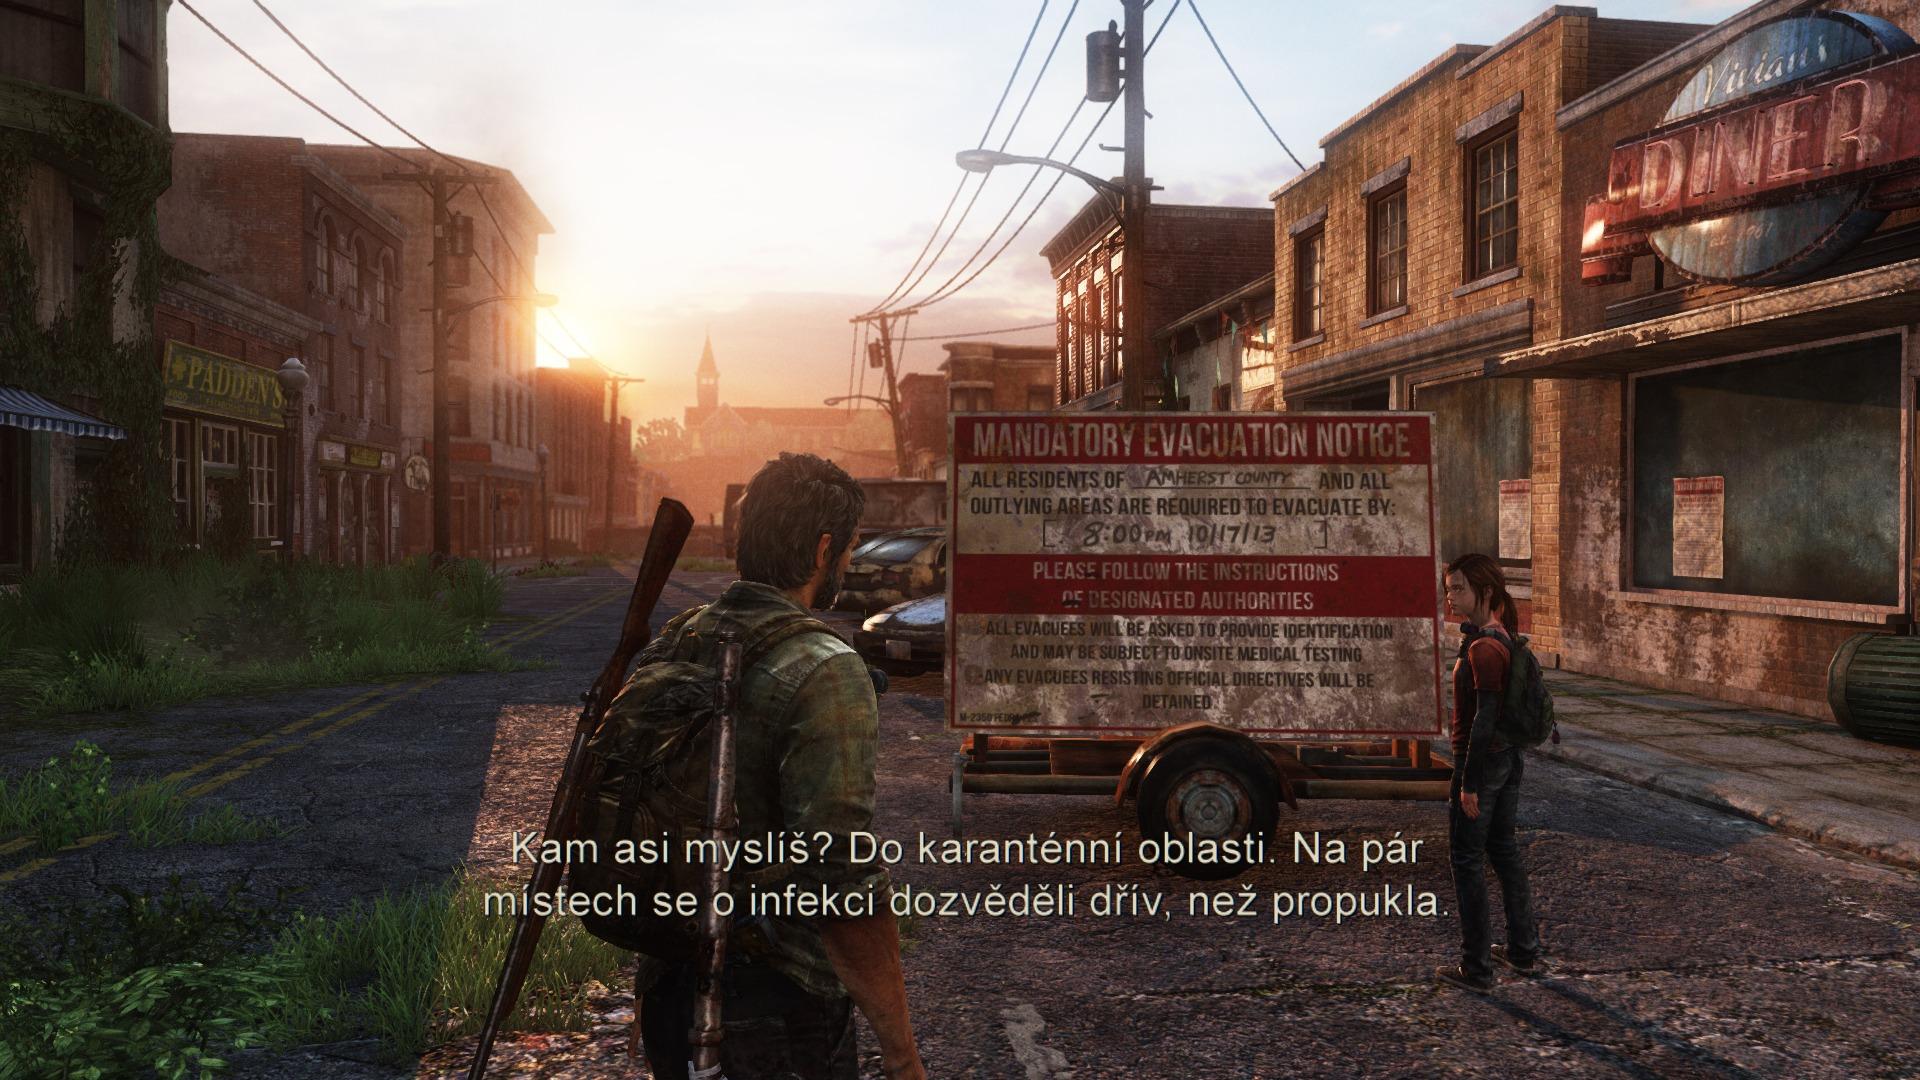 Zaostřeno na: The Last of Us Remastered 9151